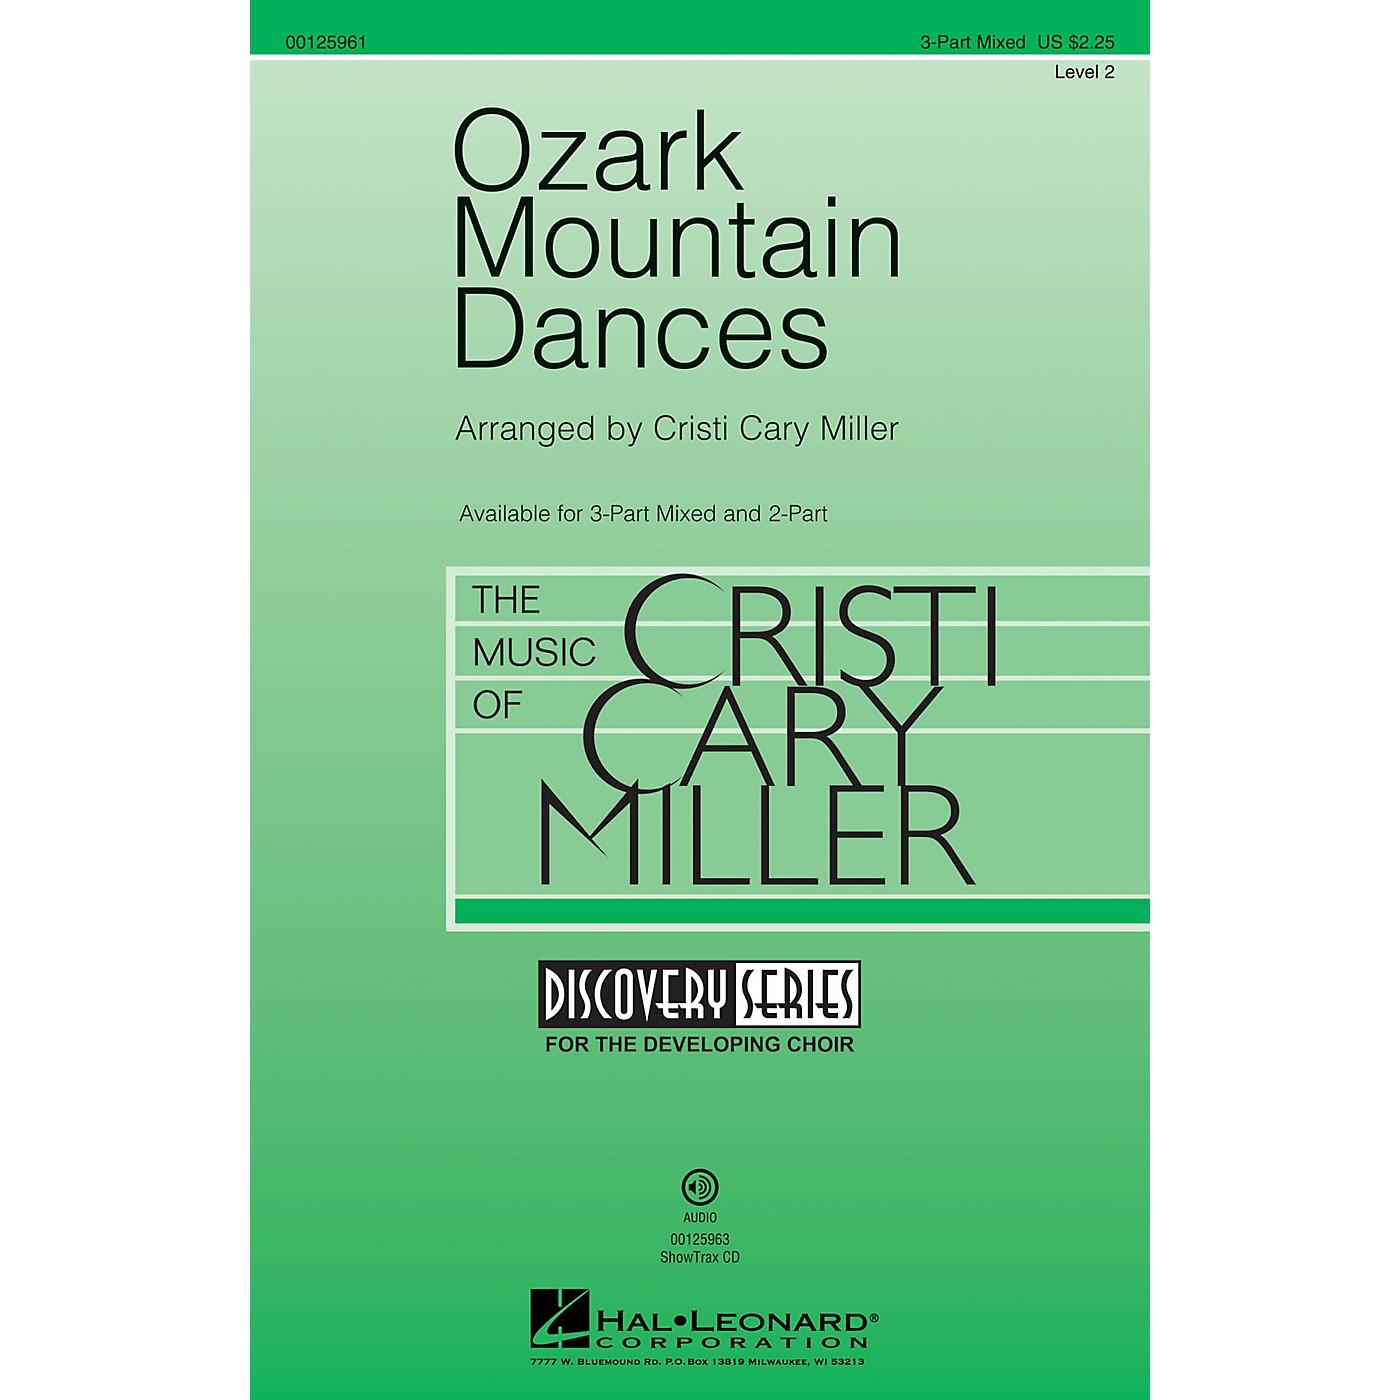 Hal Leonard Ozark Mountain Dances (Medley Discovery Level 2) ShowTrax CD Arranged by Cristi Cary Miller thumbnail